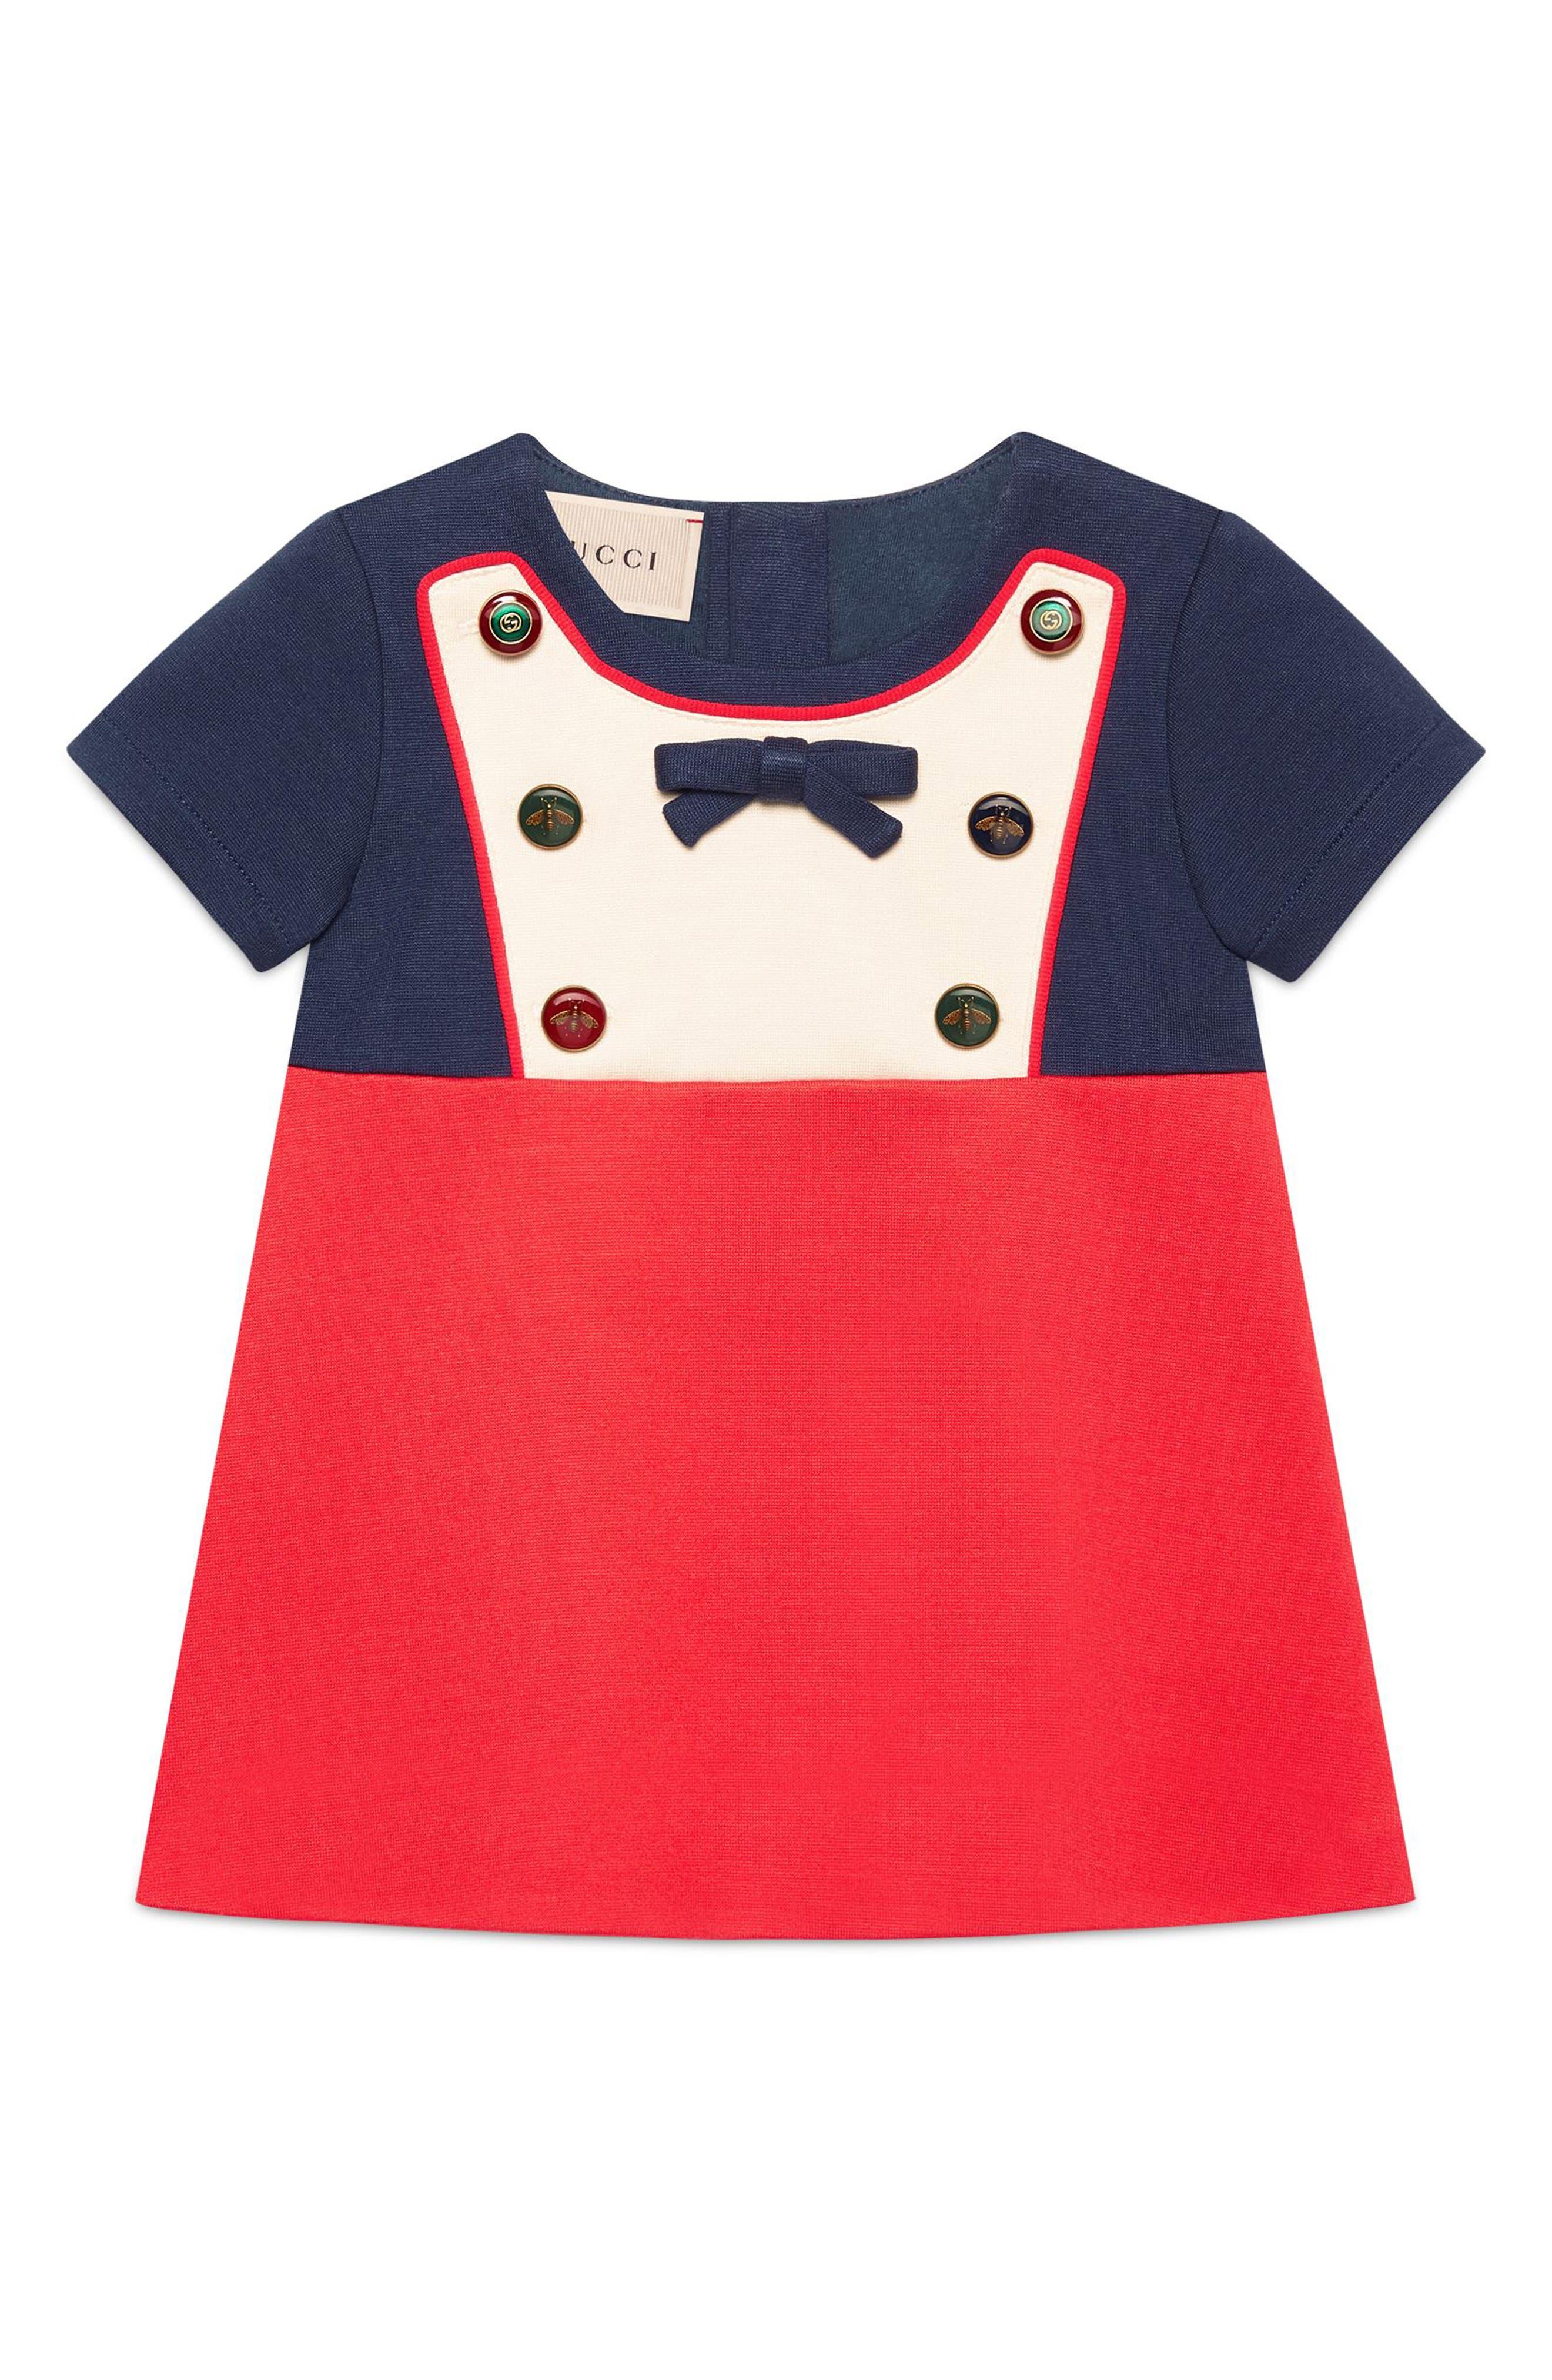 Gucci Colorblock Bib Dress (Baby Girls)